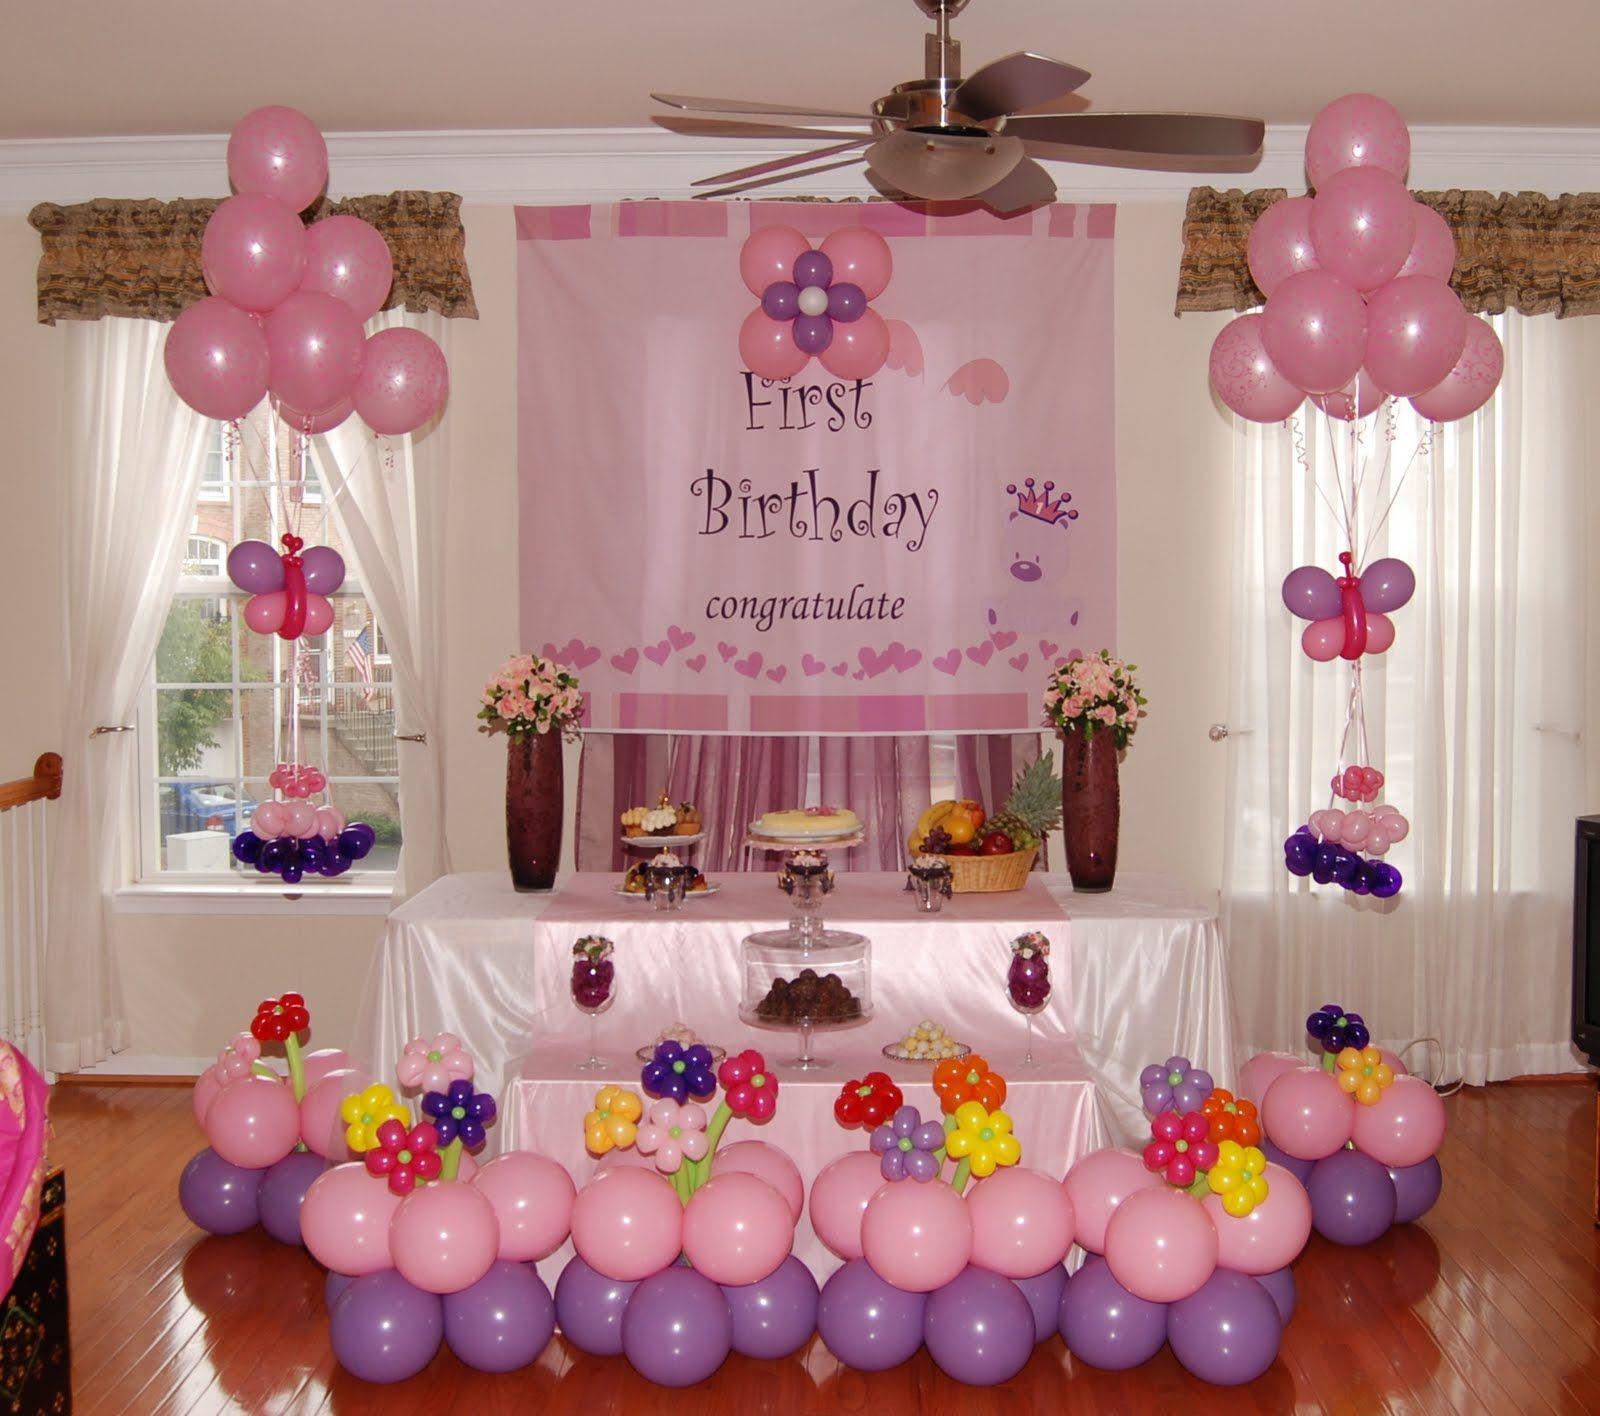 Decorating Ideas For Birthday Party At Home Gambar Dekor Sederhana